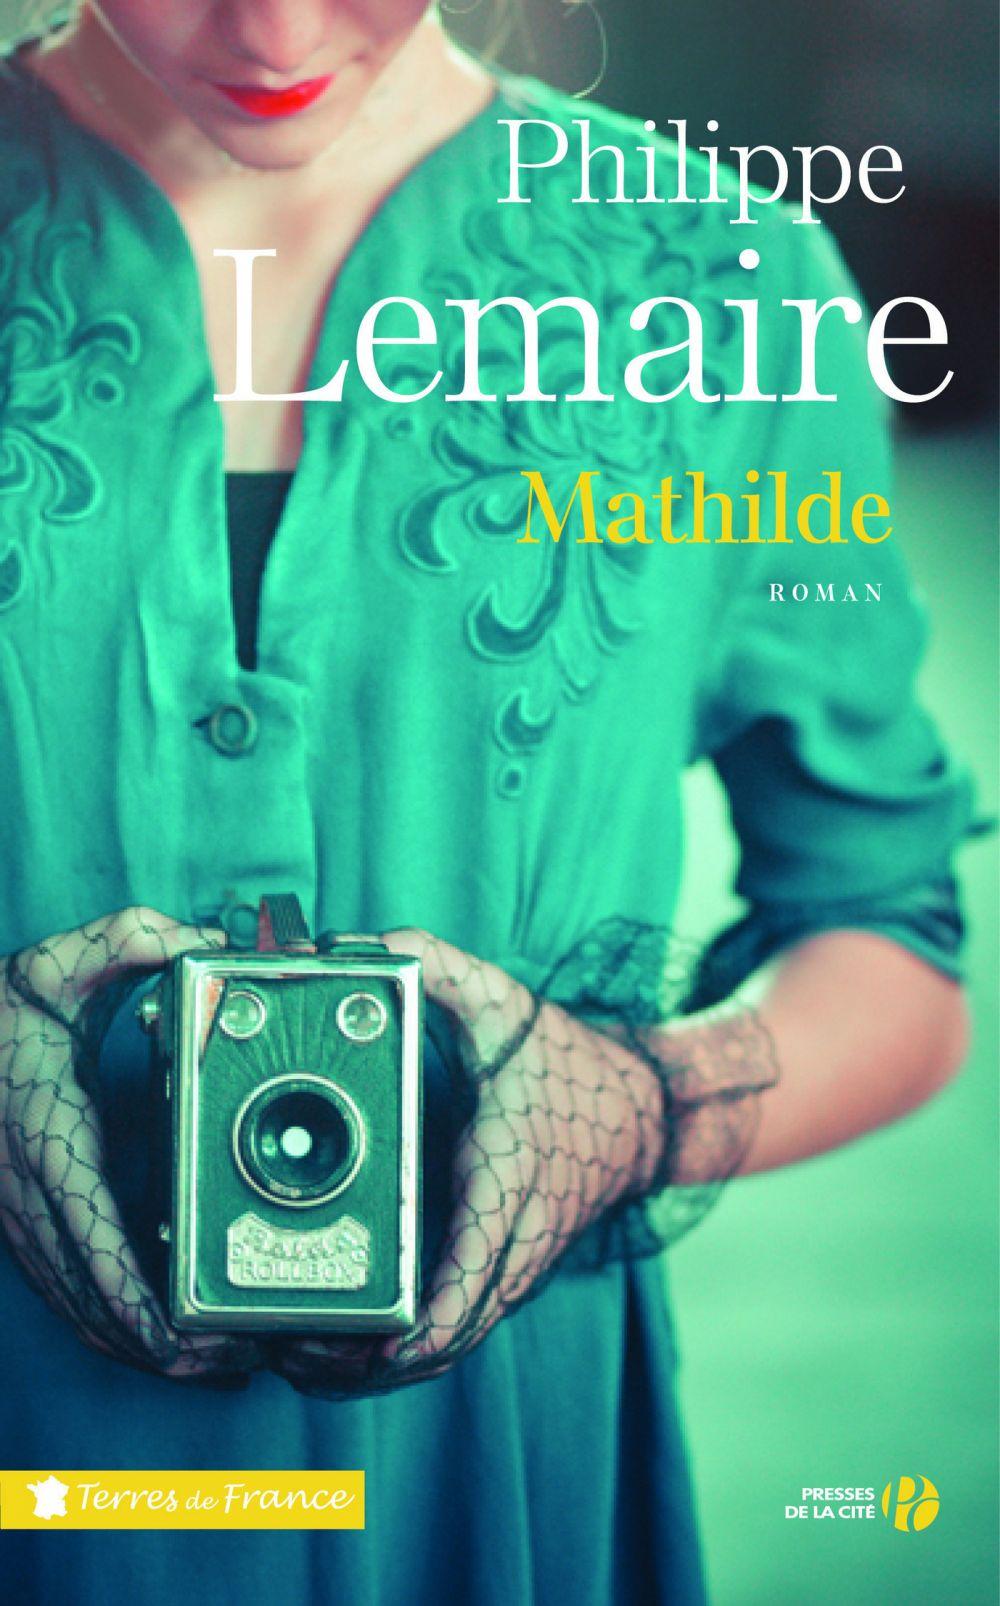 Mathilde   LEMAIRE, Philippe